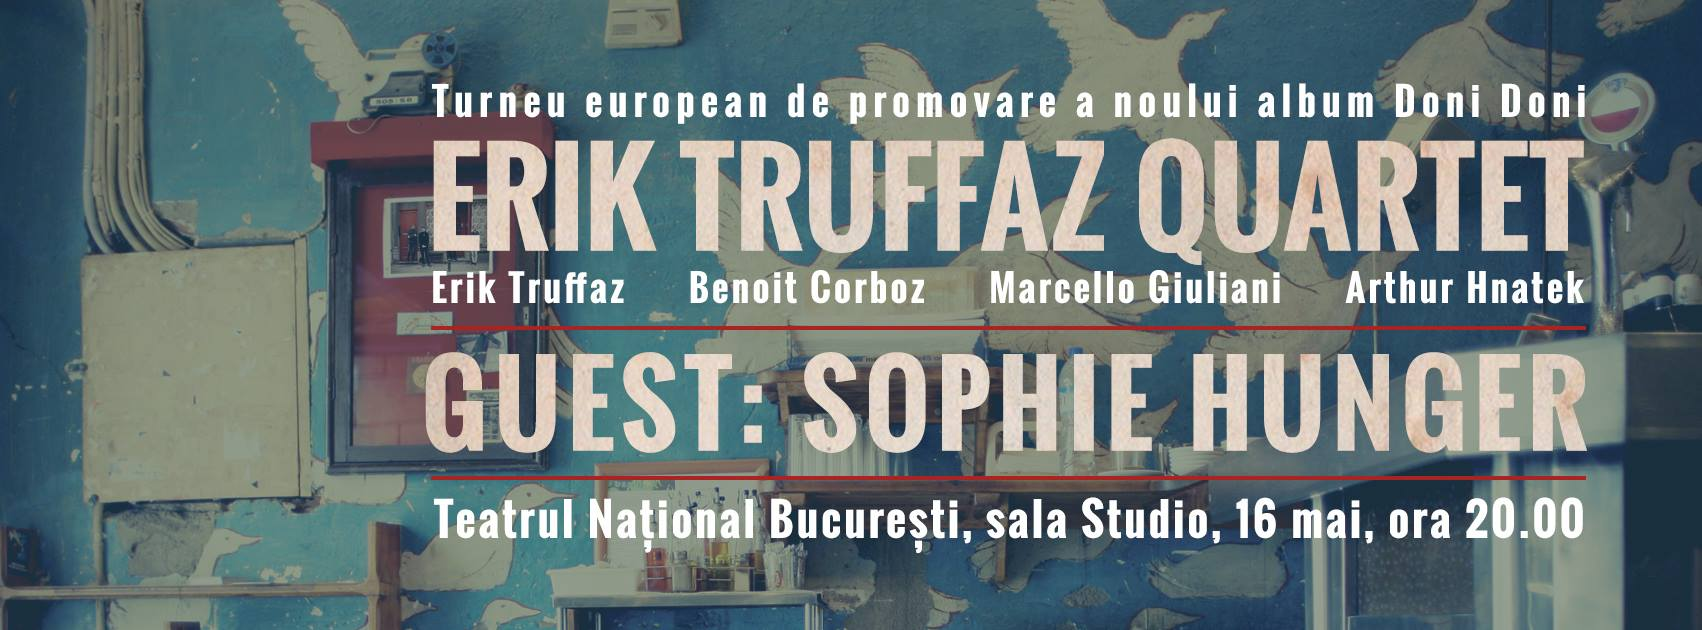 Sophie Hunger Erik Truffaz Quartet